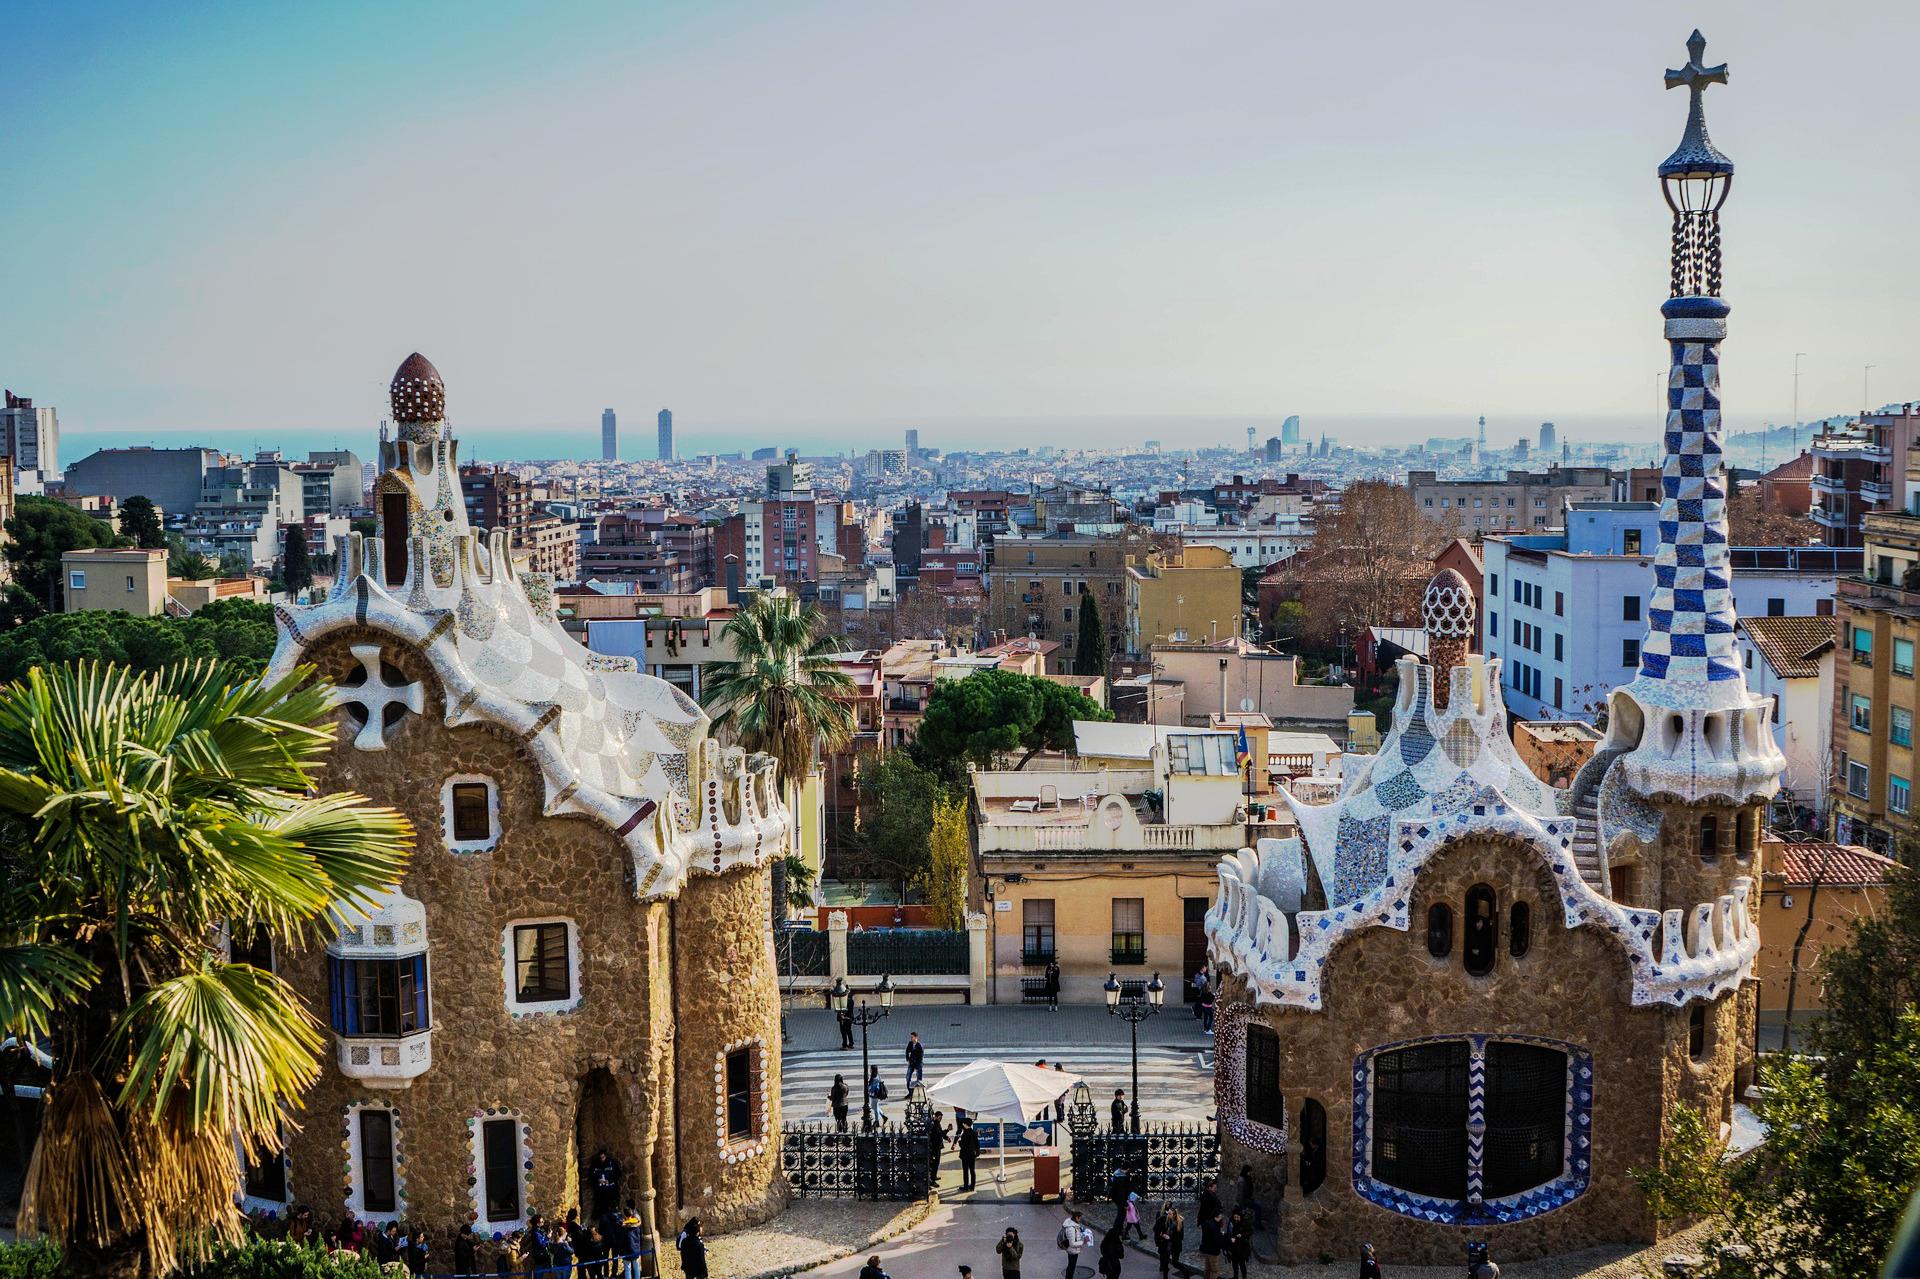 Agencja incentive, Barcelona, event, Park Guell